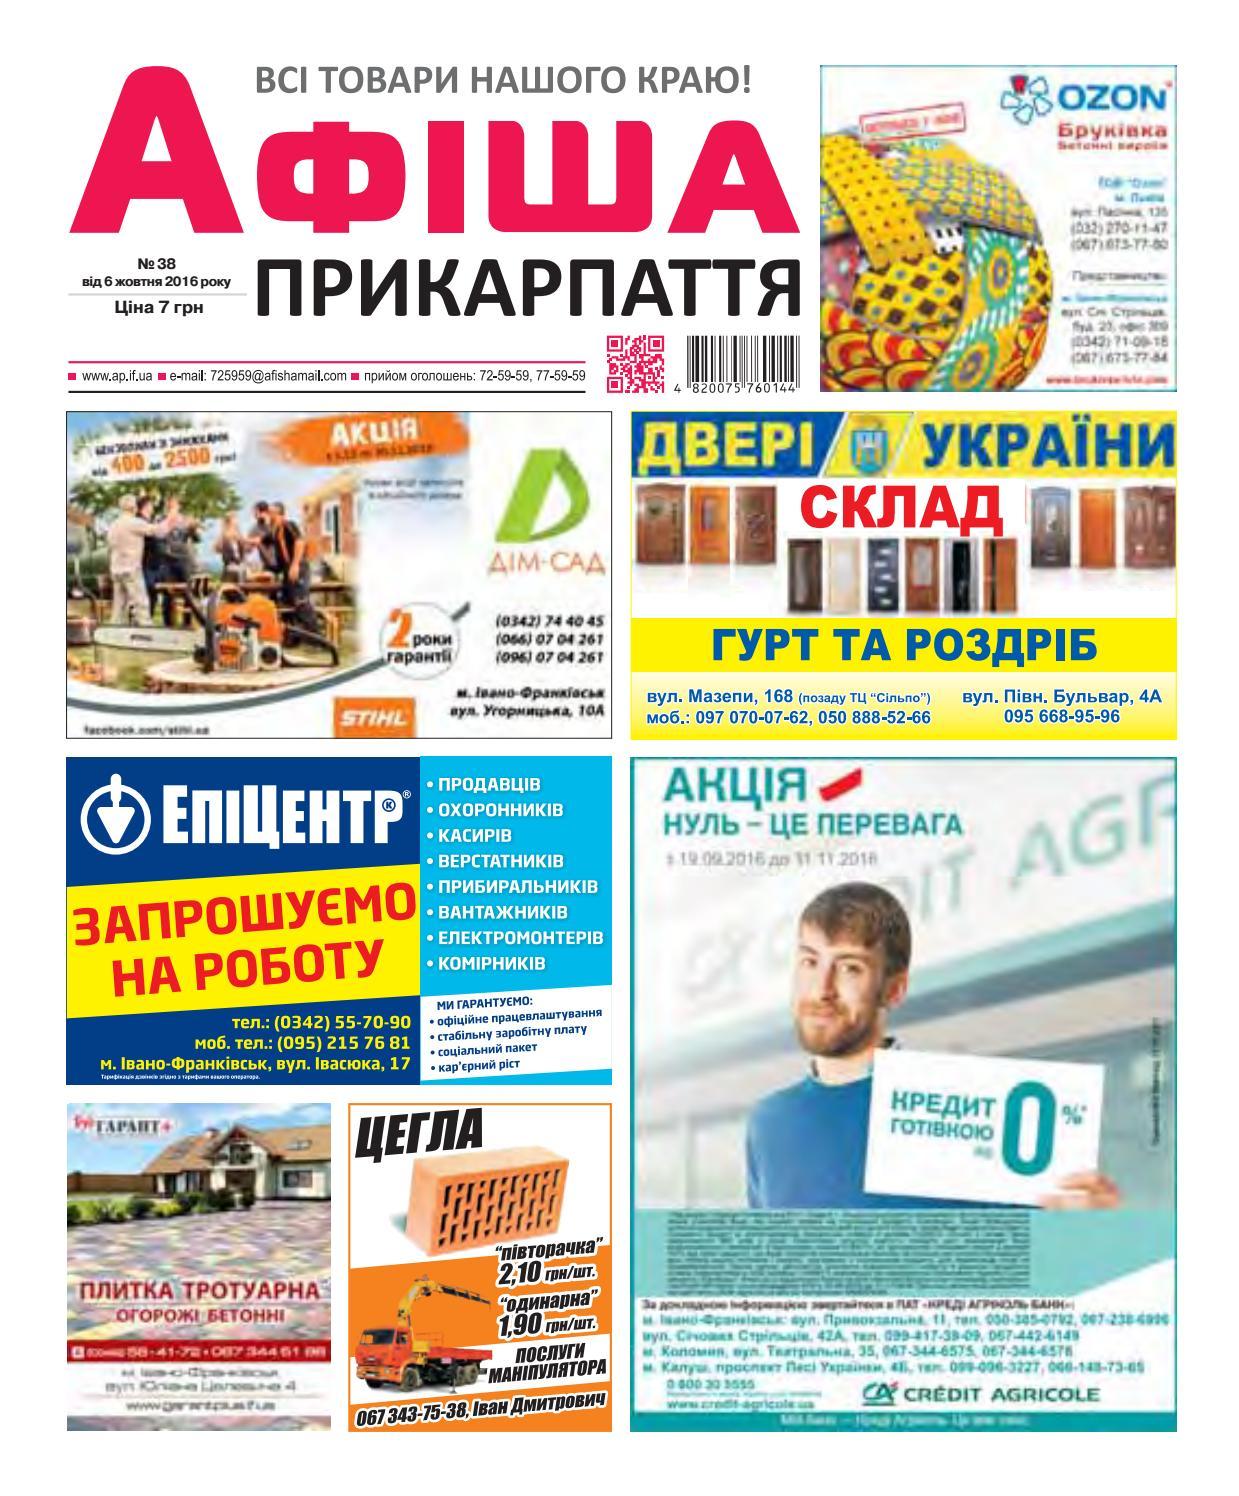 Афіша Прикарпаття №38 by Olya Olya - issuu bf7f5c574bcdf